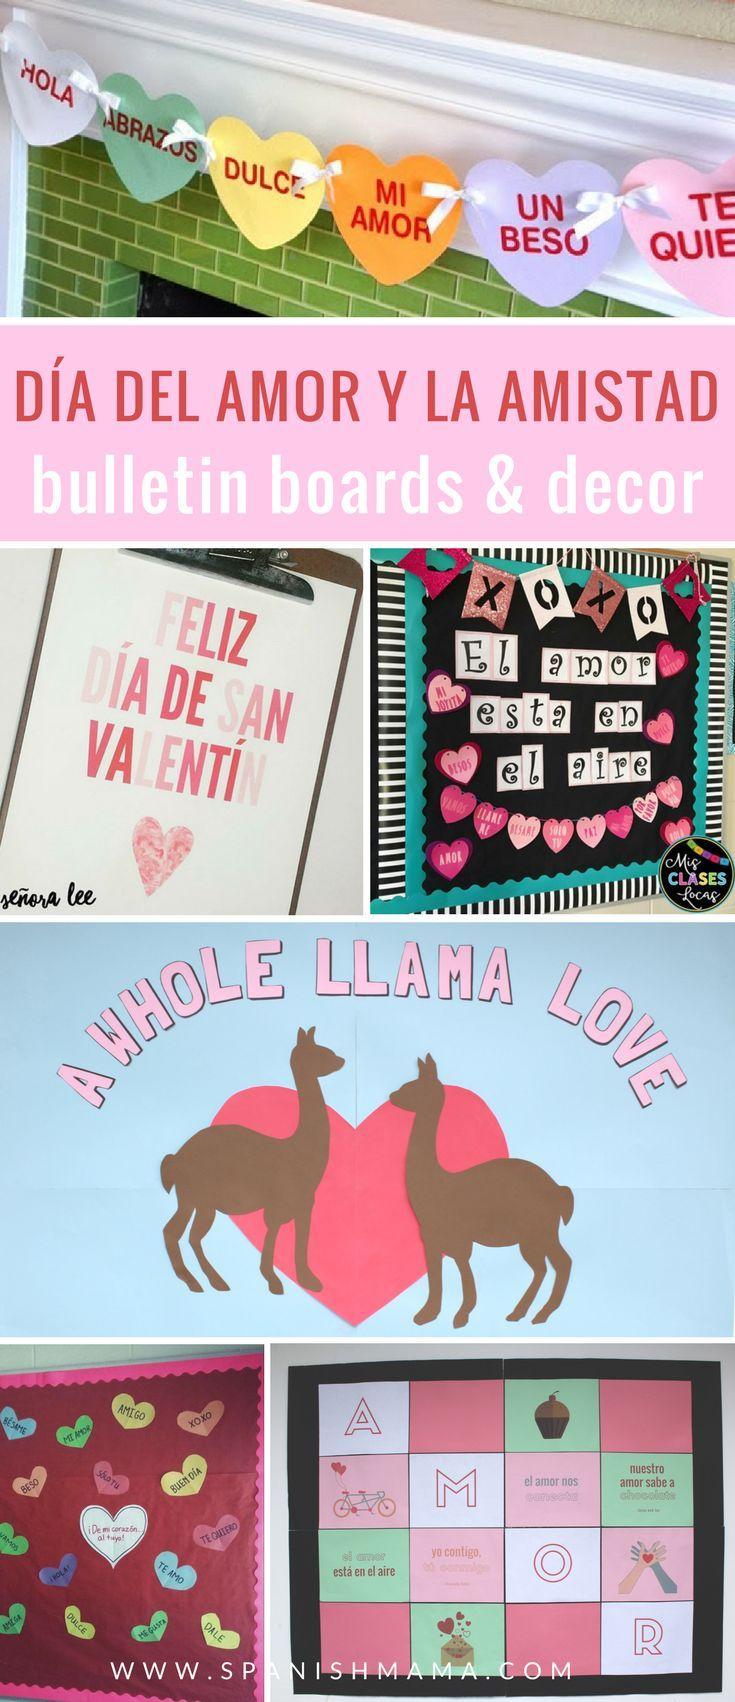 Spanish Valentine's Day Bulletin Board ideas and decor. Find fun ideas for decorating your classroom for Día de San Valentin / Día del amor y la amistad.